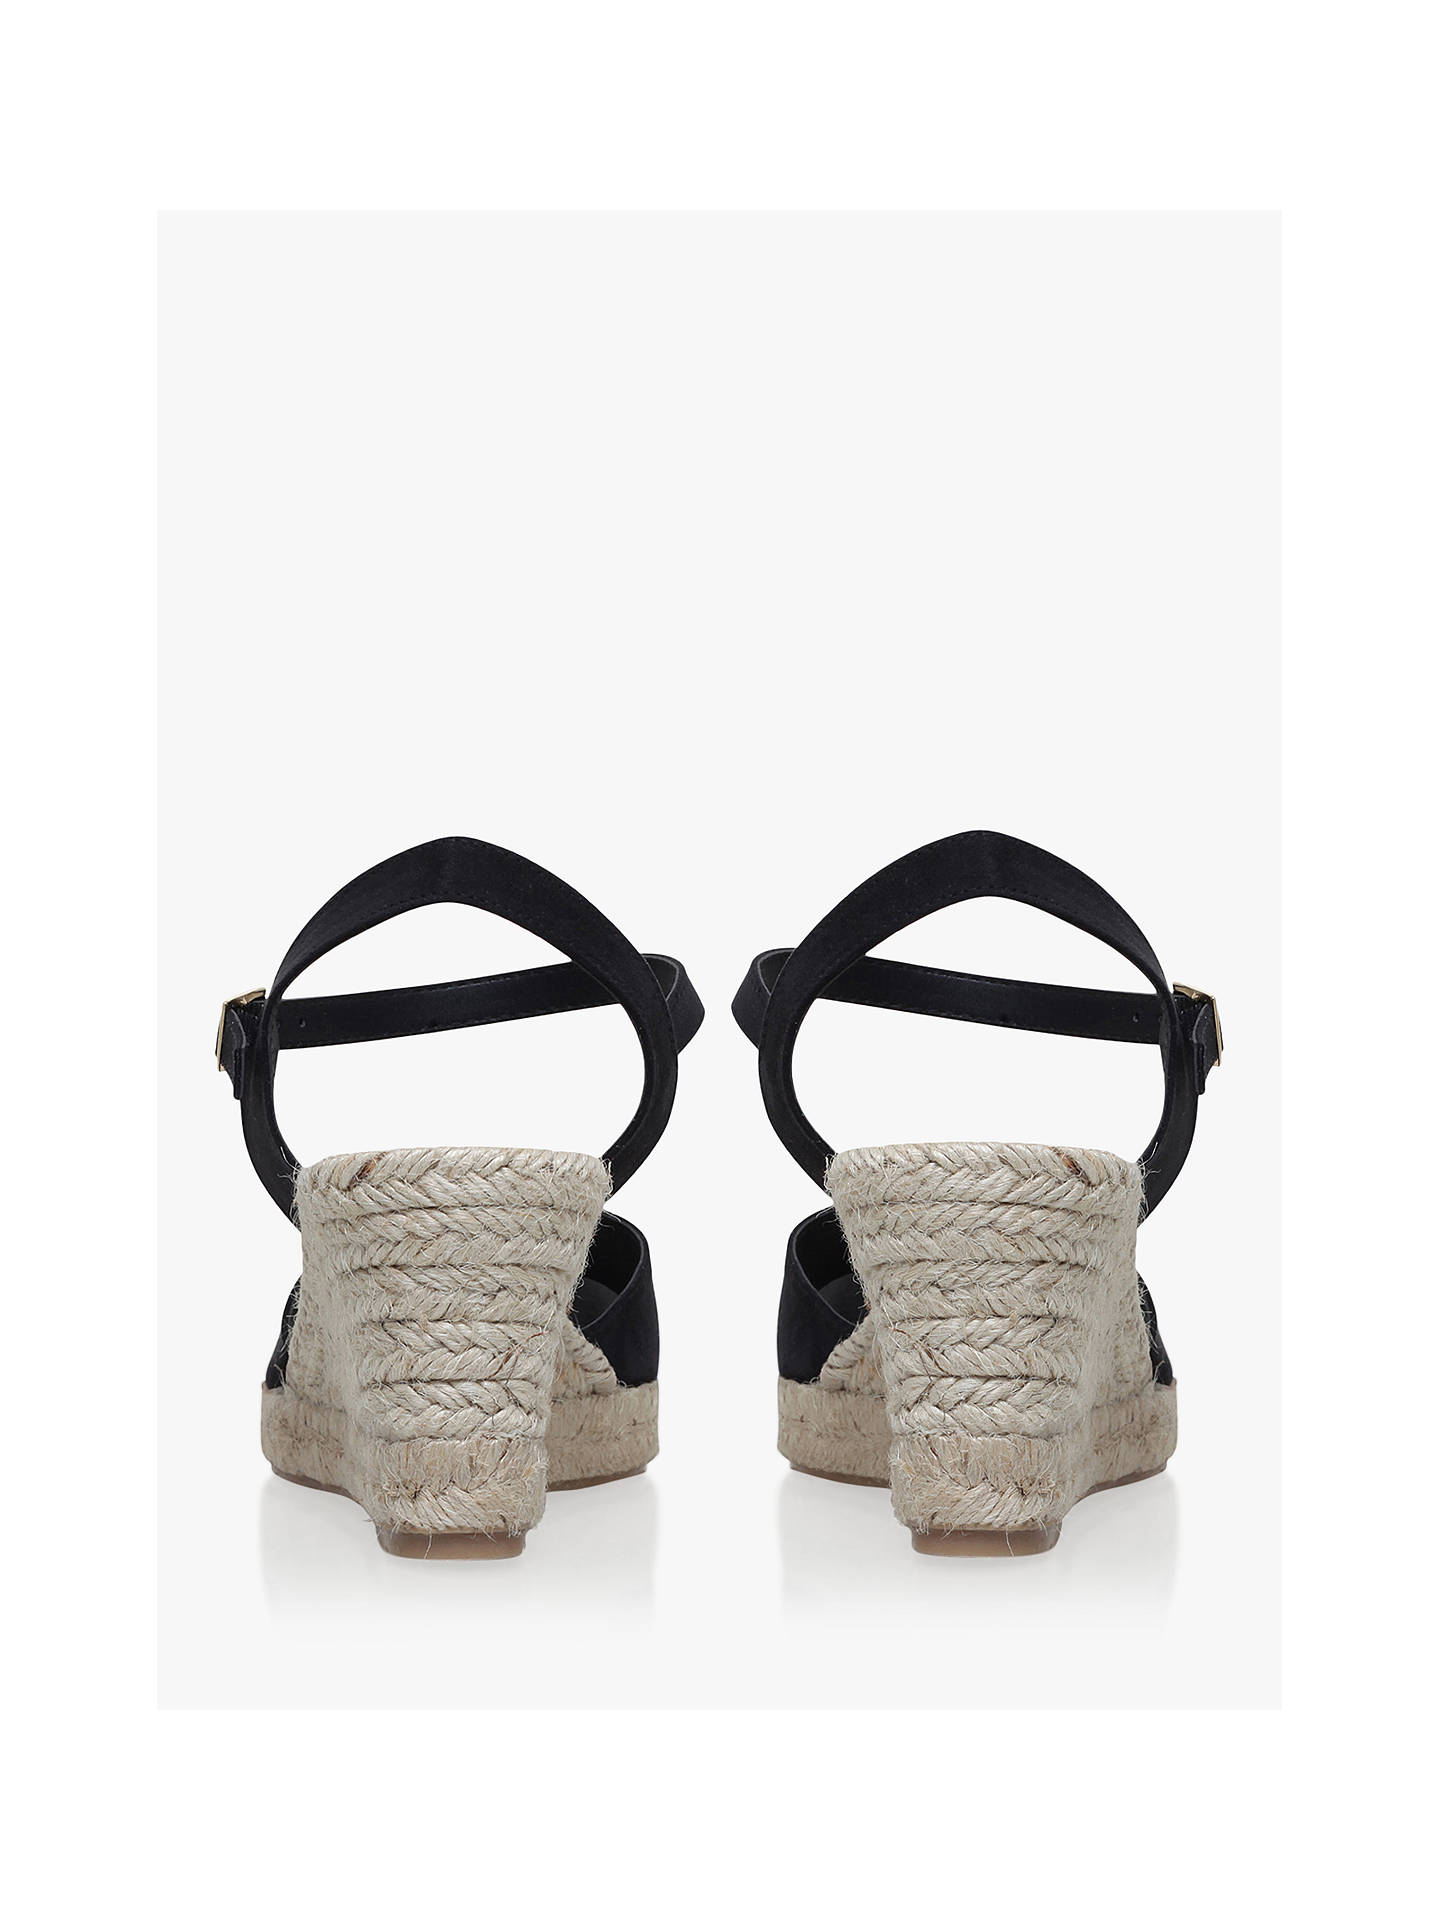 048992b07fd Carvela Sabrina 2 Wedge Heel Sandals, Black, Black